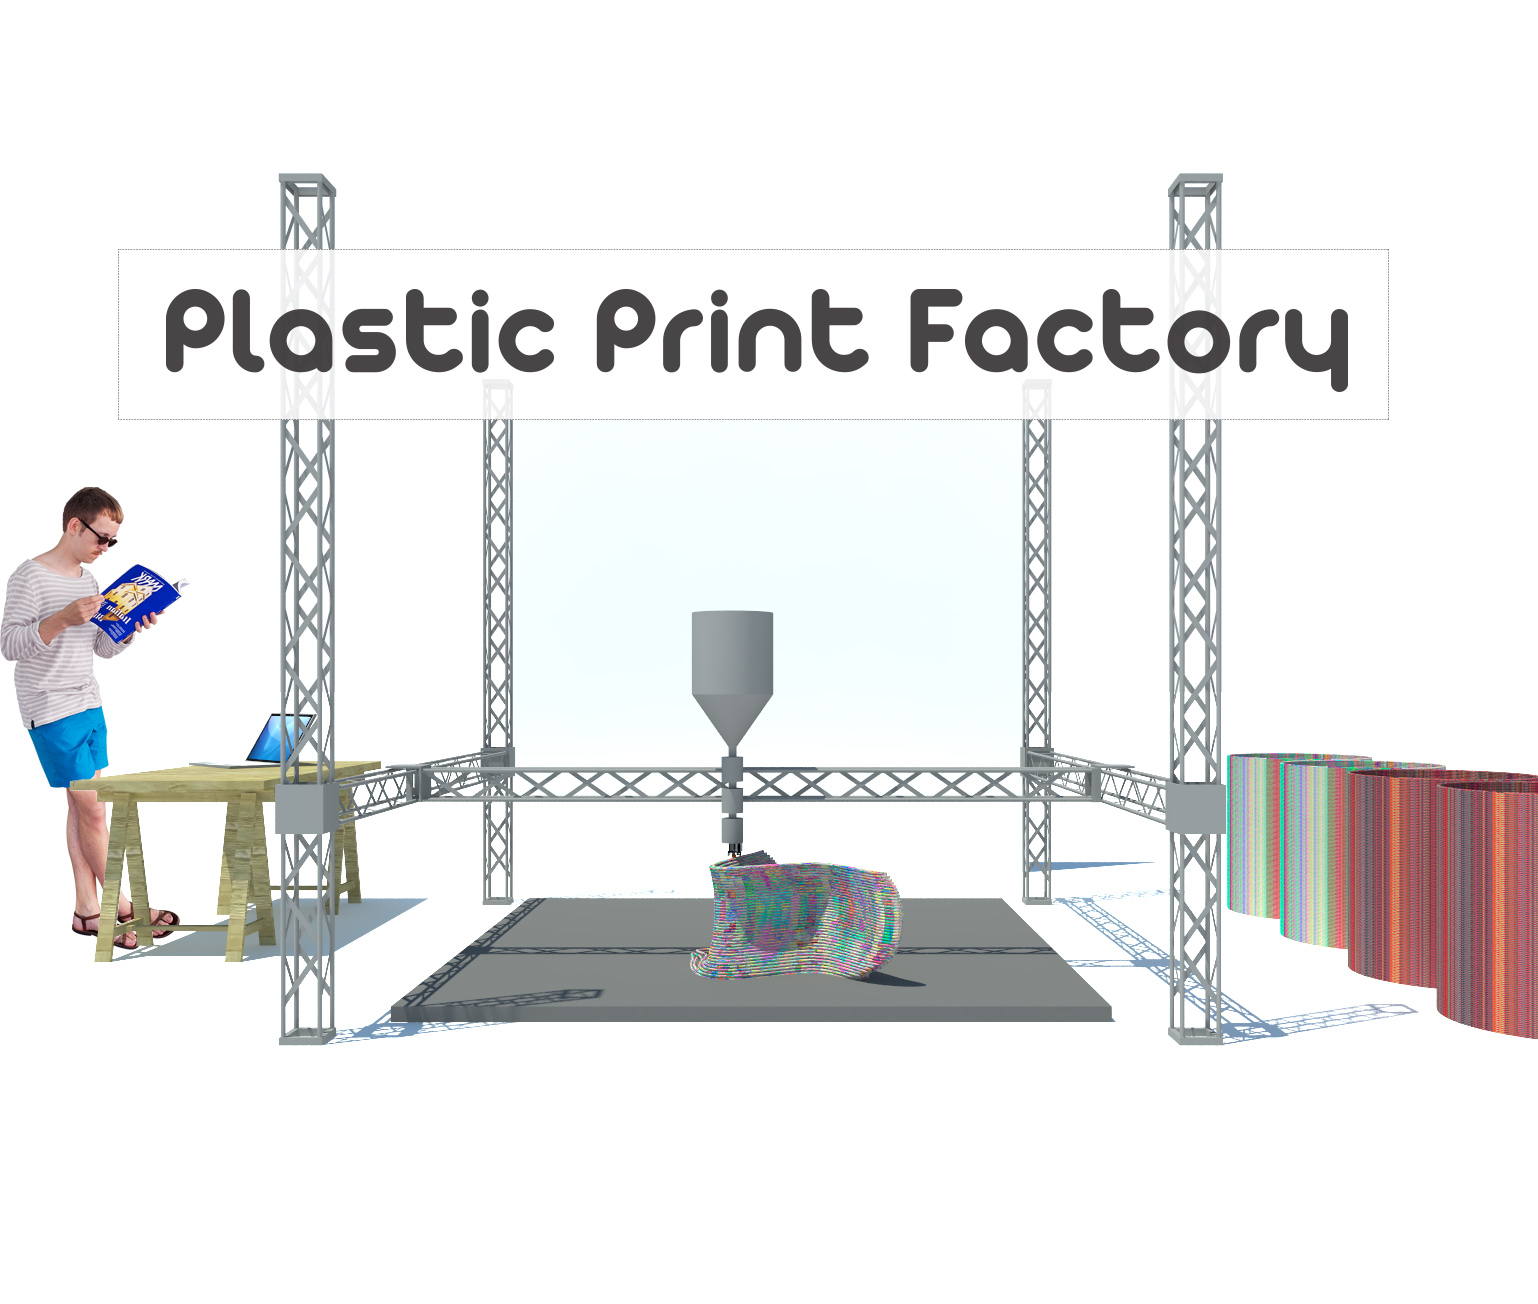 Plastic Print Factory